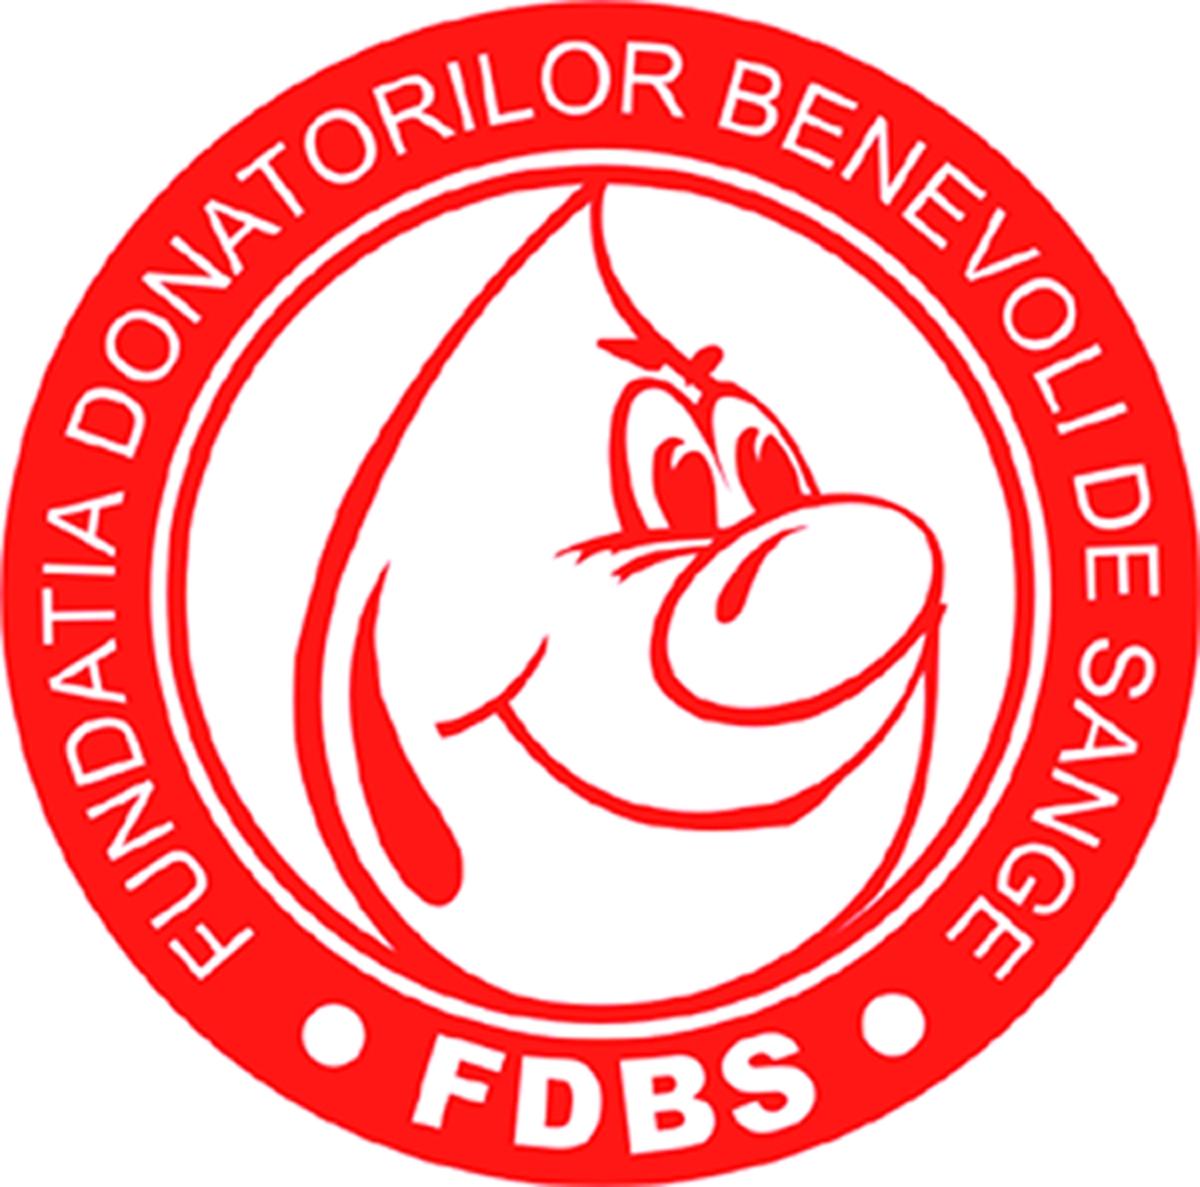 Fundația Donatorilor Benevoli de Sânge logo